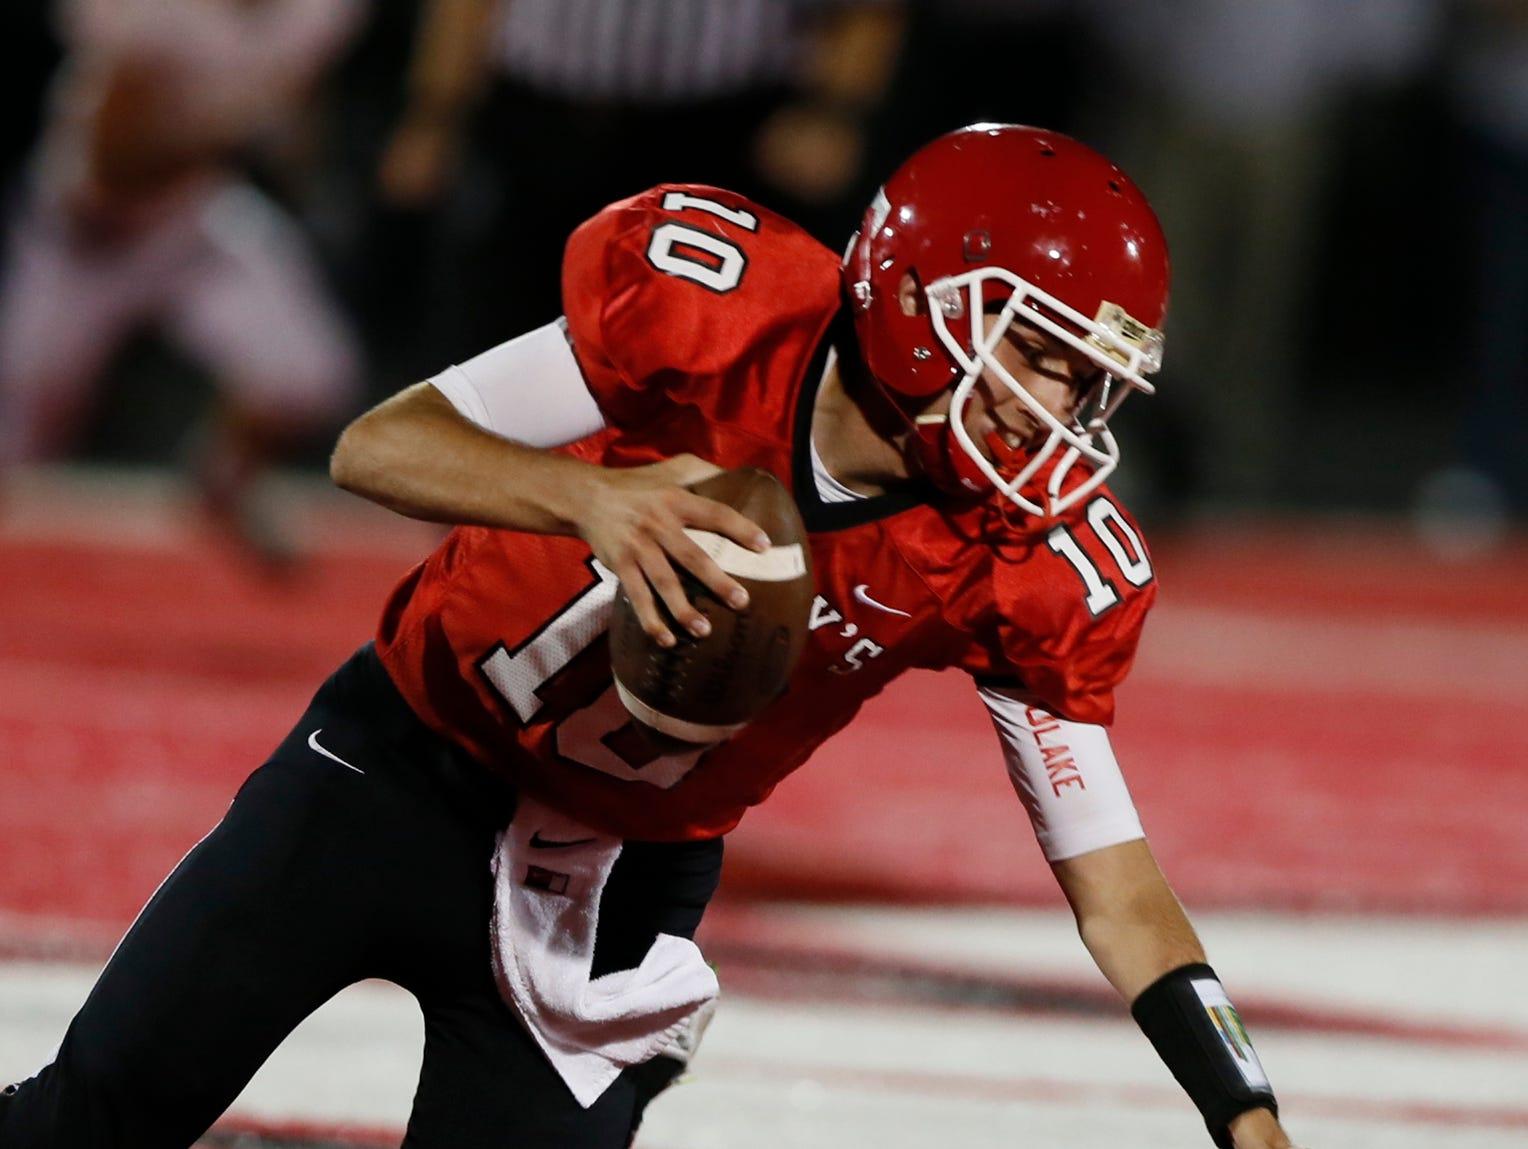 Orchard Lake St. Mary's quarterback Brendan Tabone